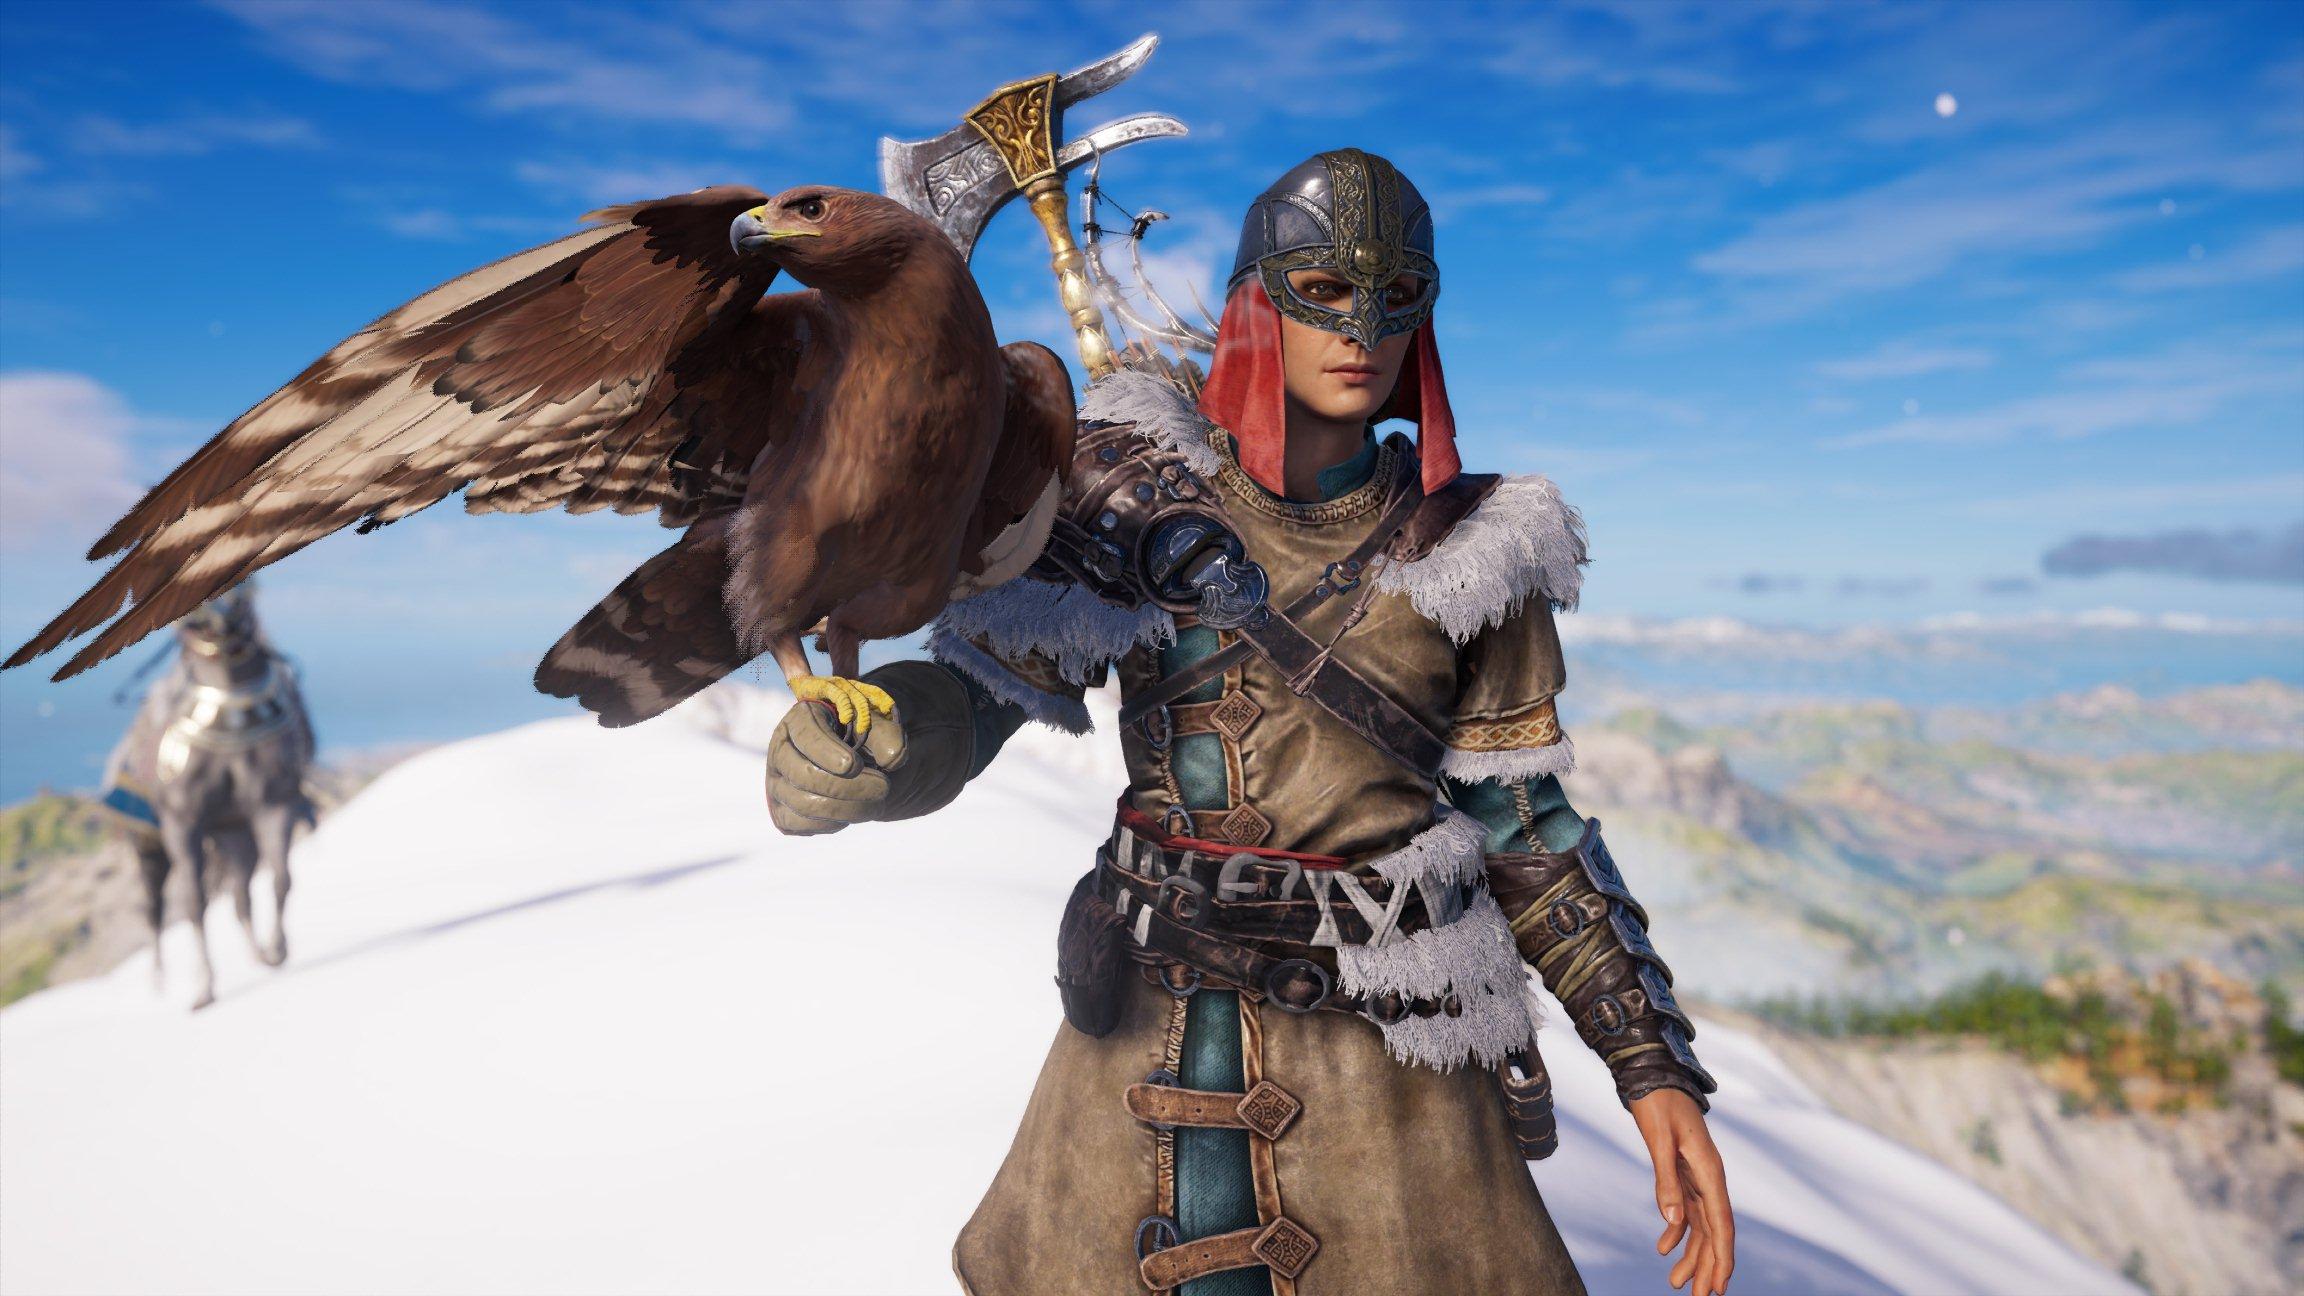 2020088033245.jpg - Assassin's Creed: Odyssey